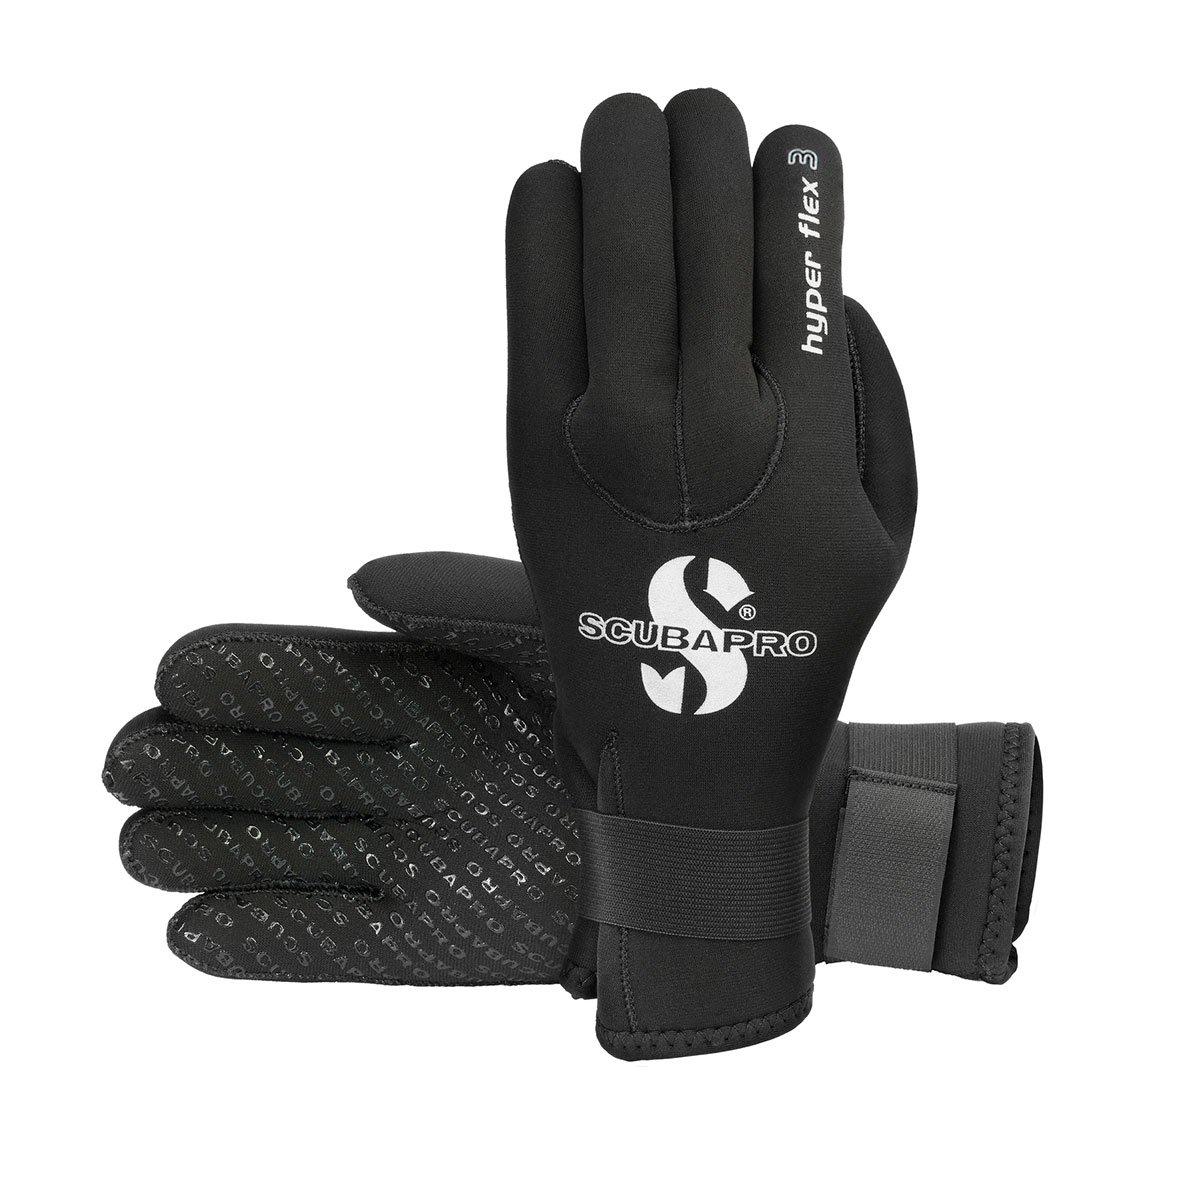 Scuba Pro Hyperflex Gloves (3MM)